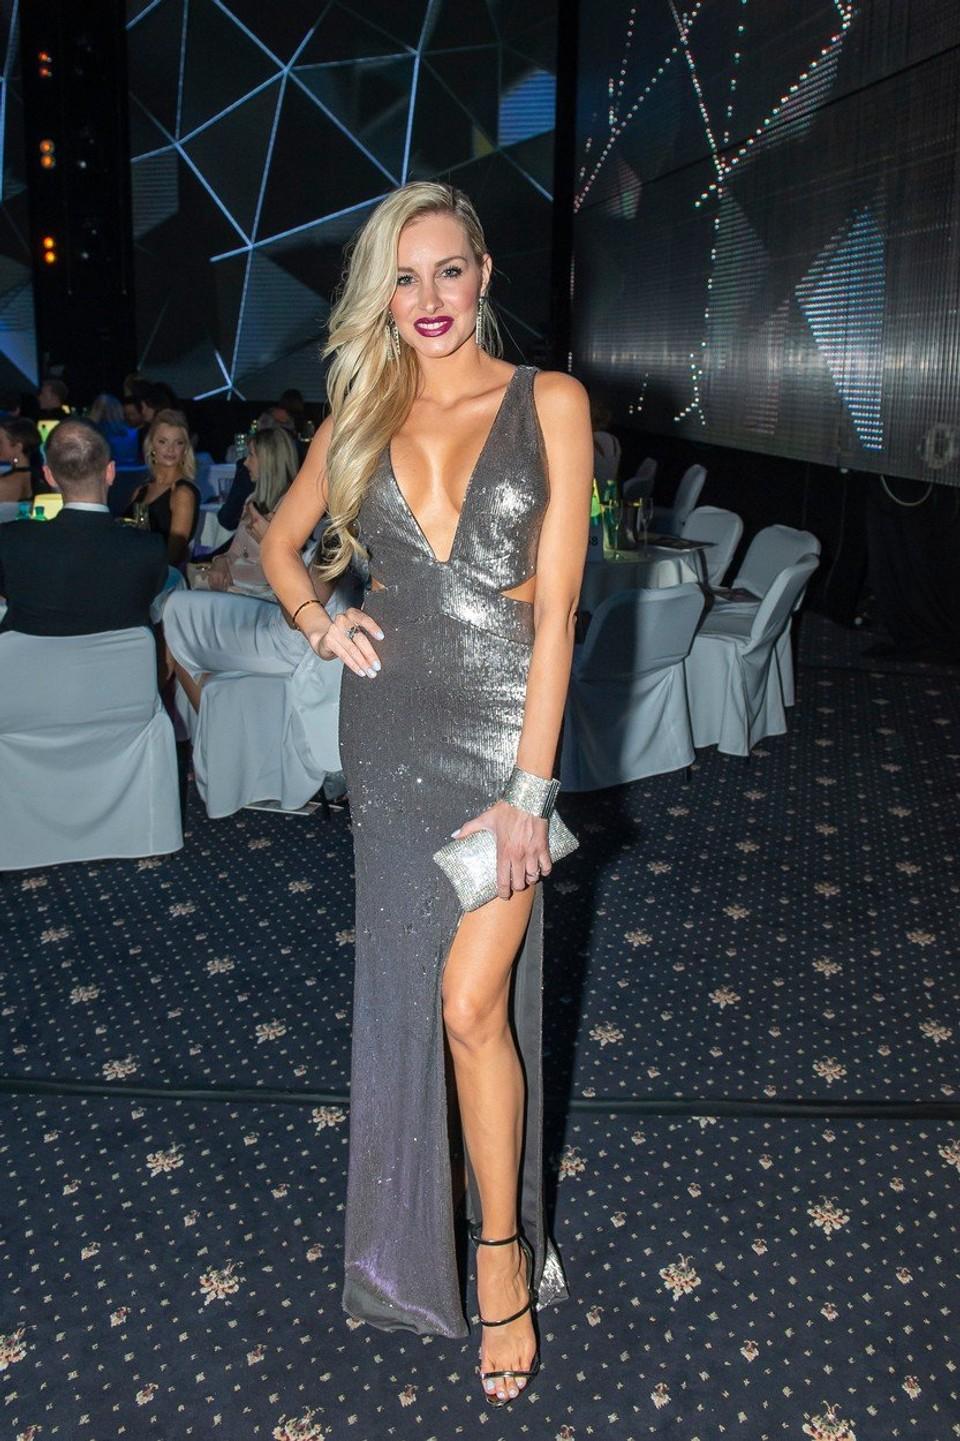 Denisa Mendrejová - finalistka Miss Slovensko 2006